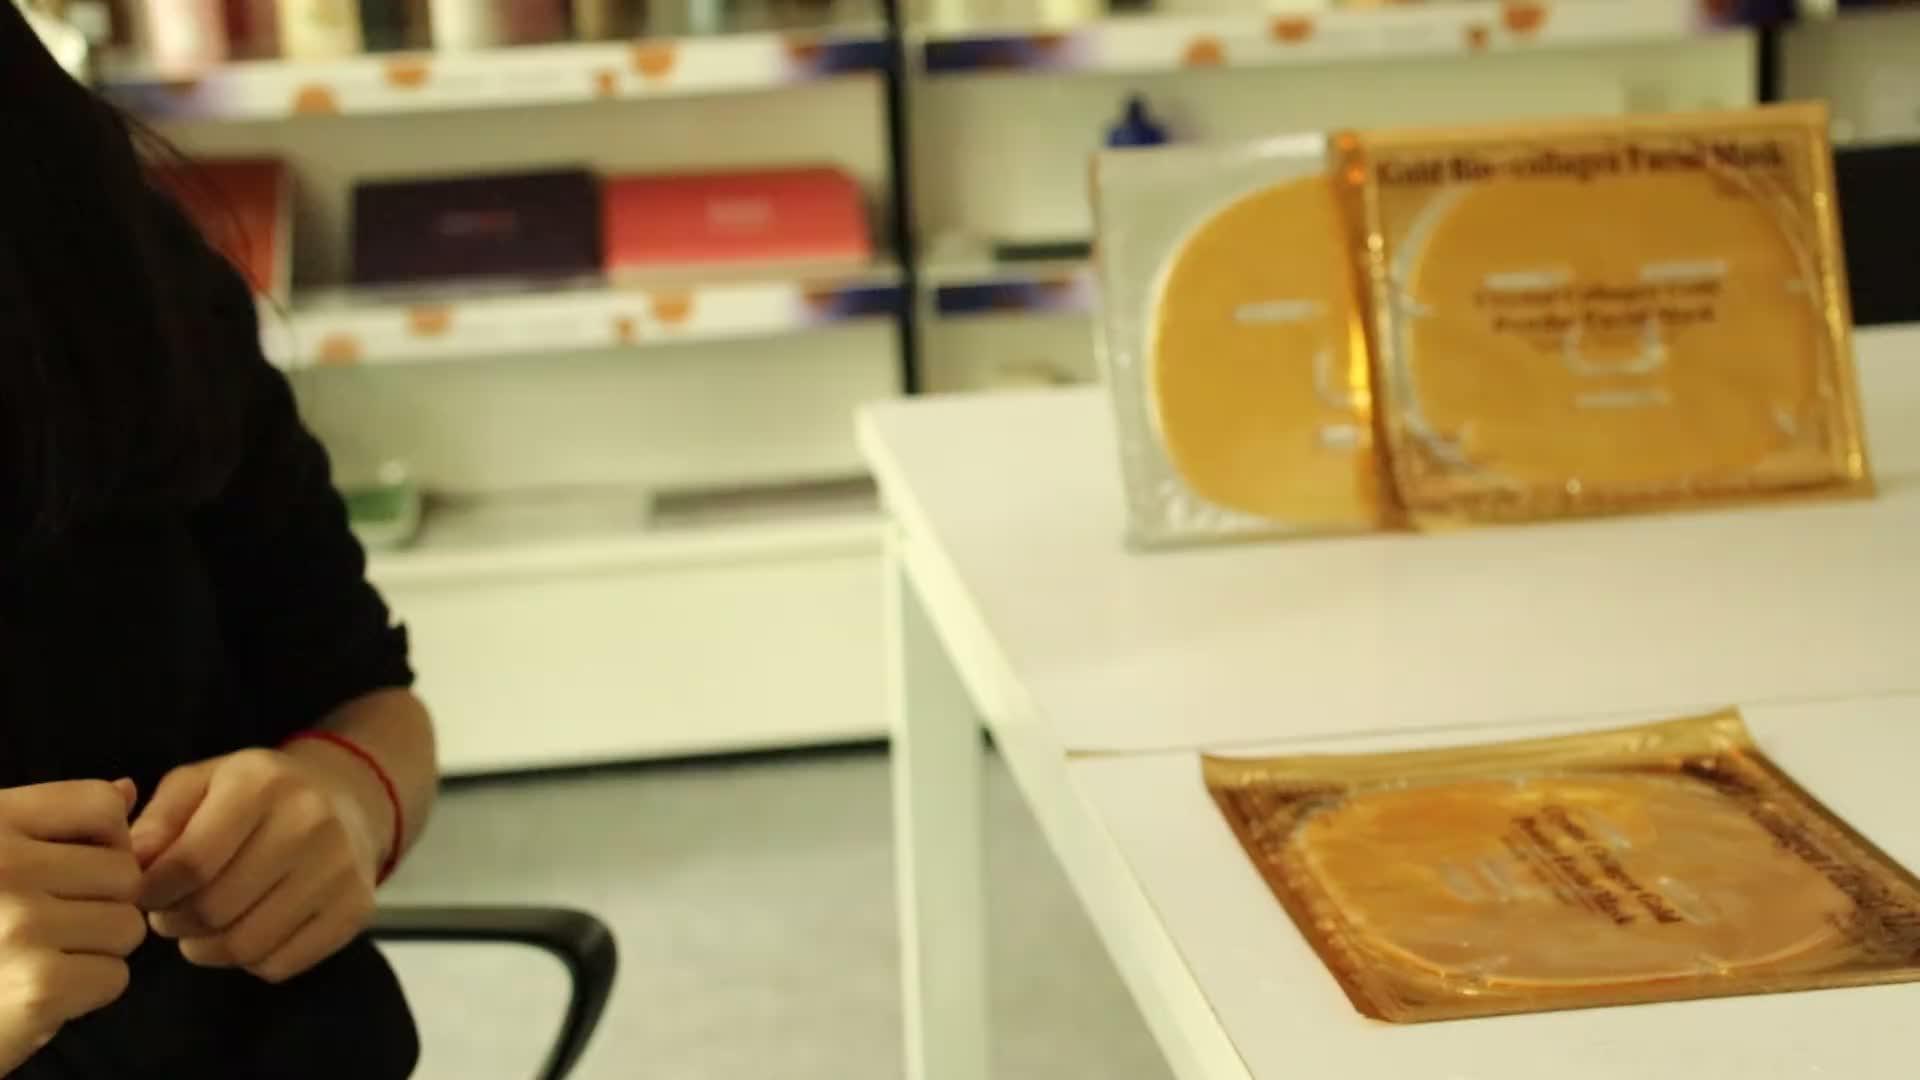 Private label huidverzorging facial 24 k gold bio-collageen gouden gezichtsmasker